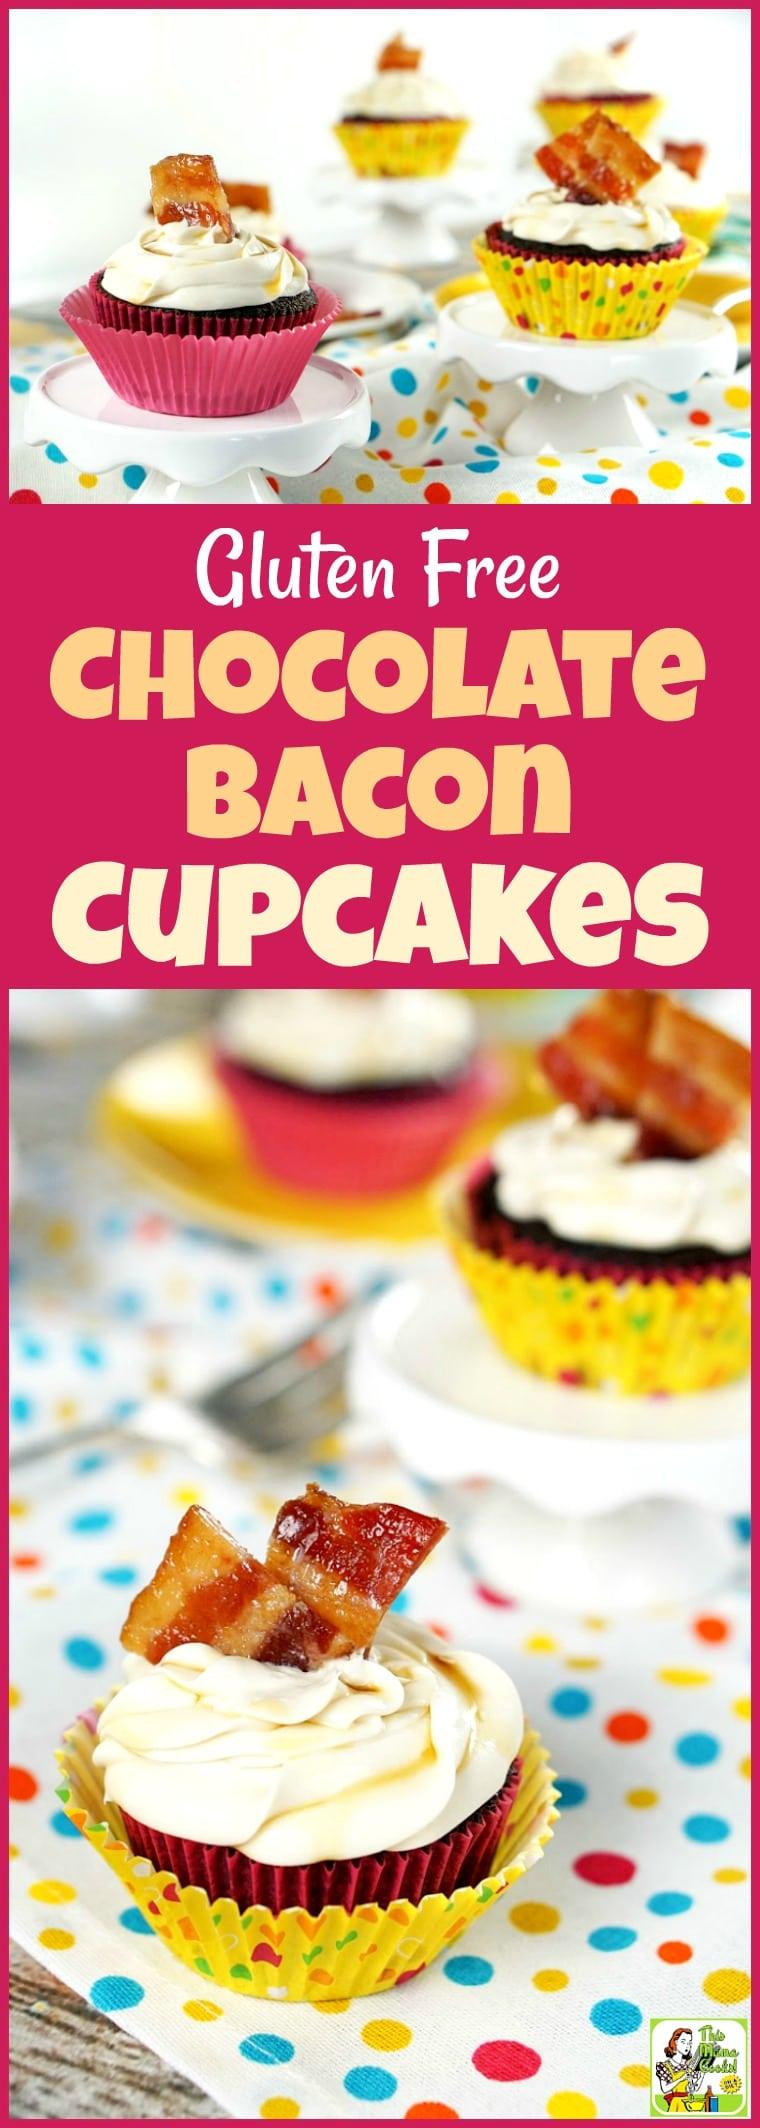 Gluten Free Chocolate Bacon Cupcakes